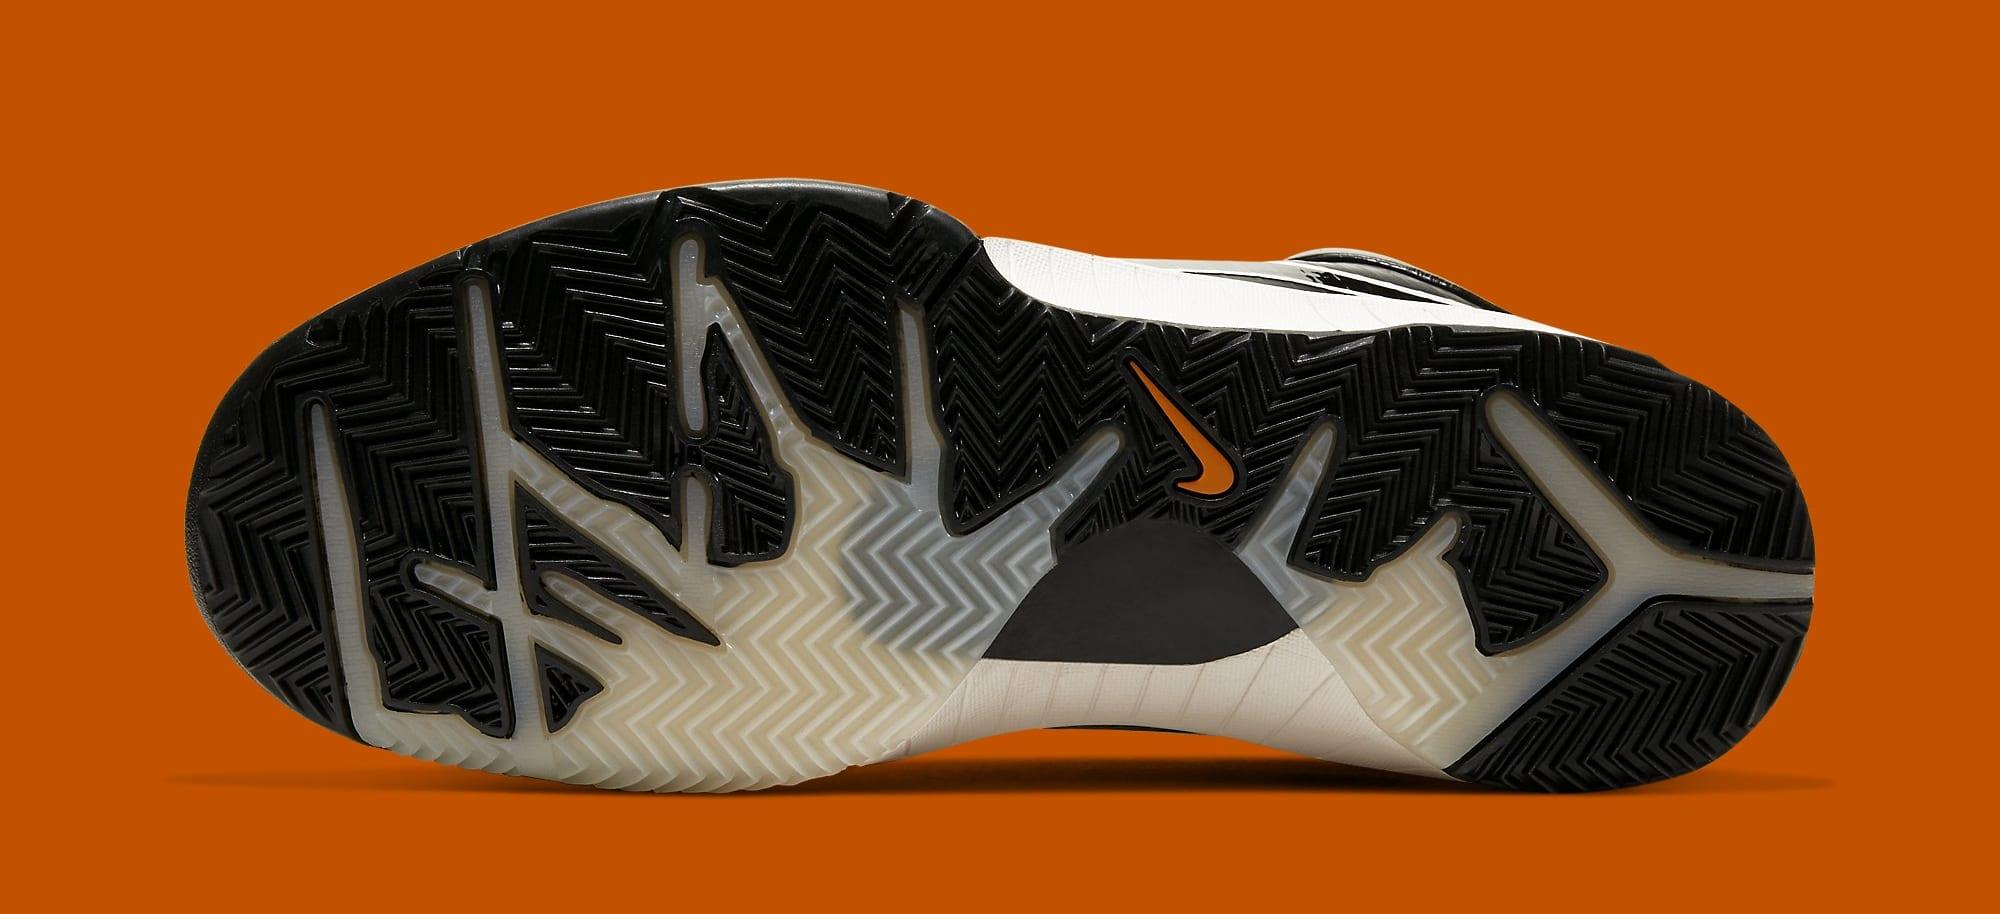 Undefeated x Nike Kobe 4 Protro 'Black Mamba' CQ3869-001 (Bottom)